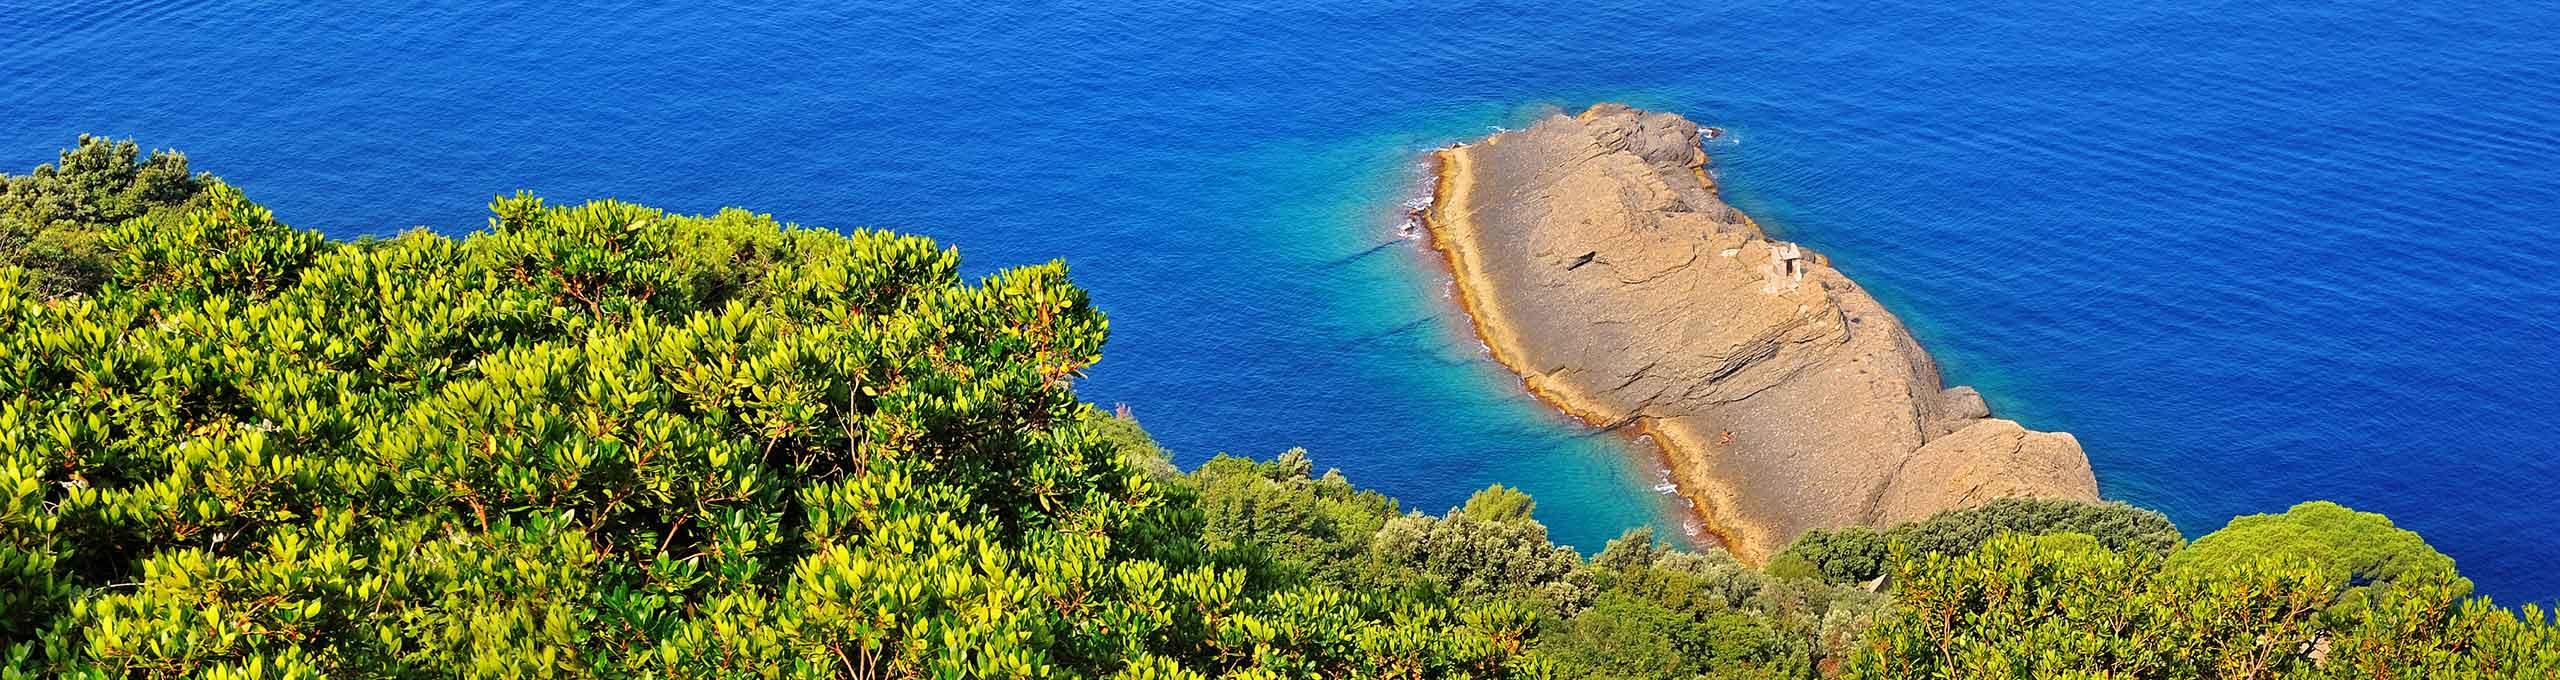 Punta Chiappa,  Golfo Paradiso, Liguria